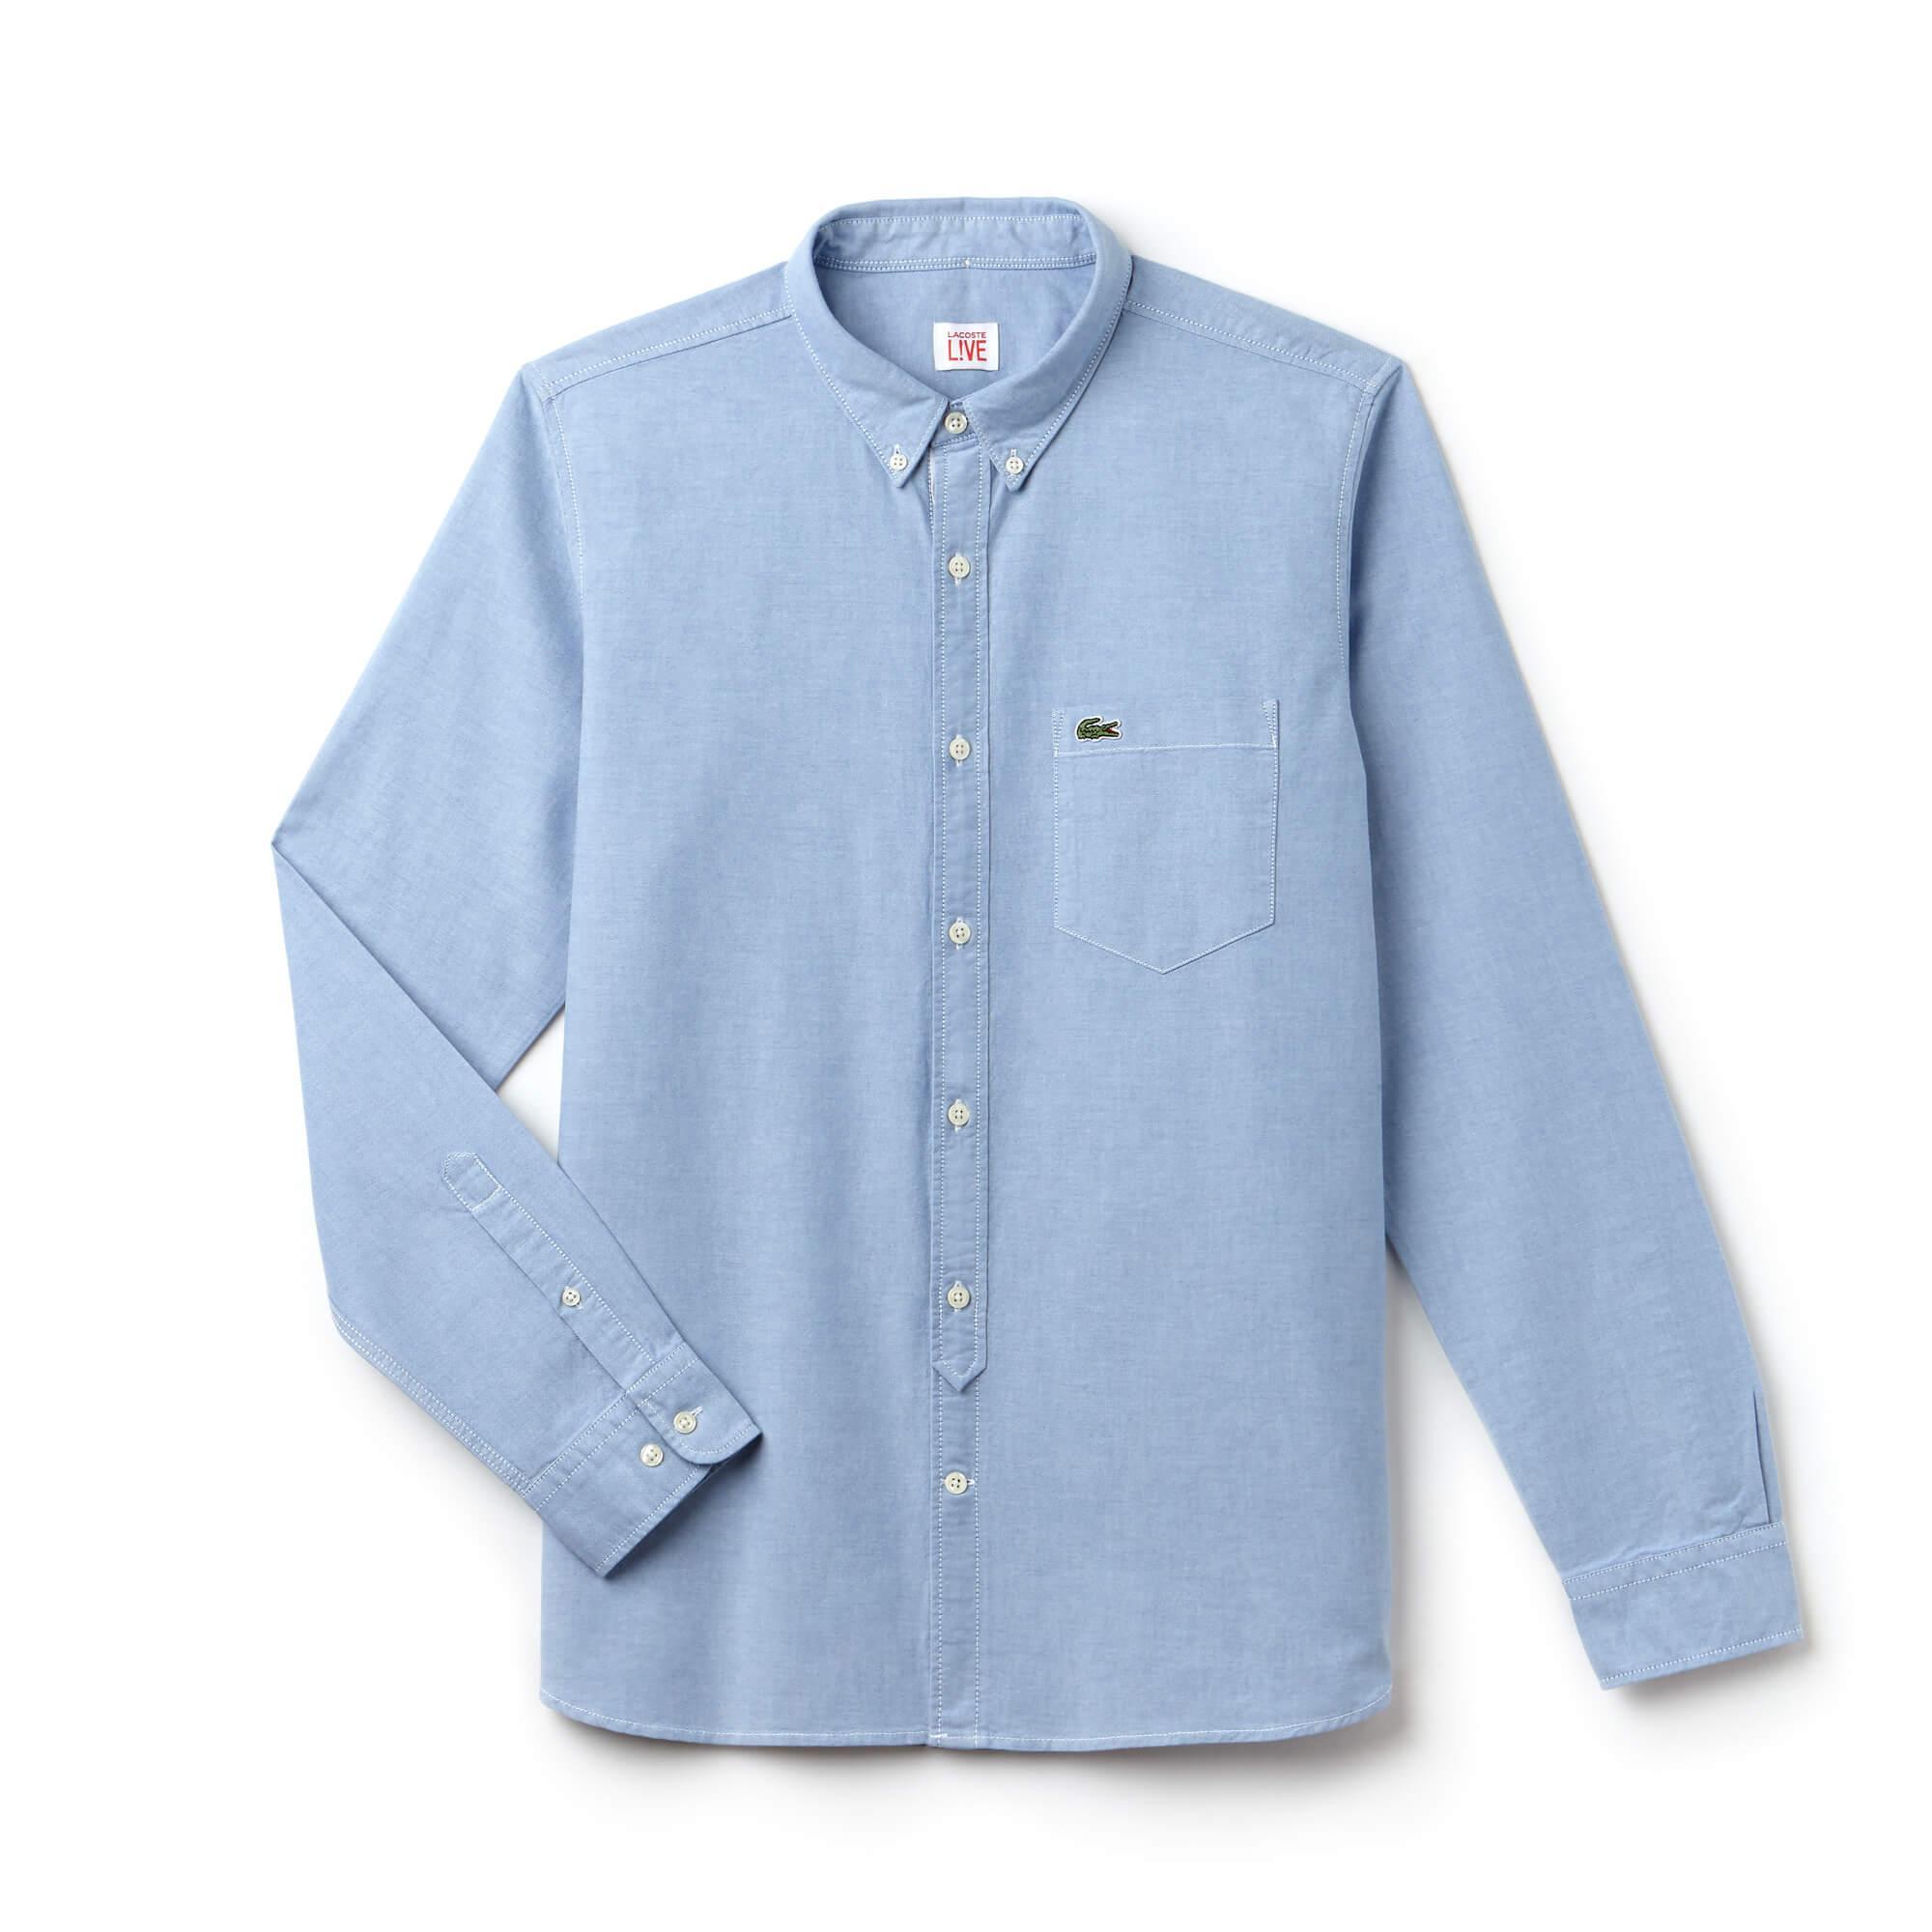 Lacoste Live Erkek Slim Fit Mavi Gömlek